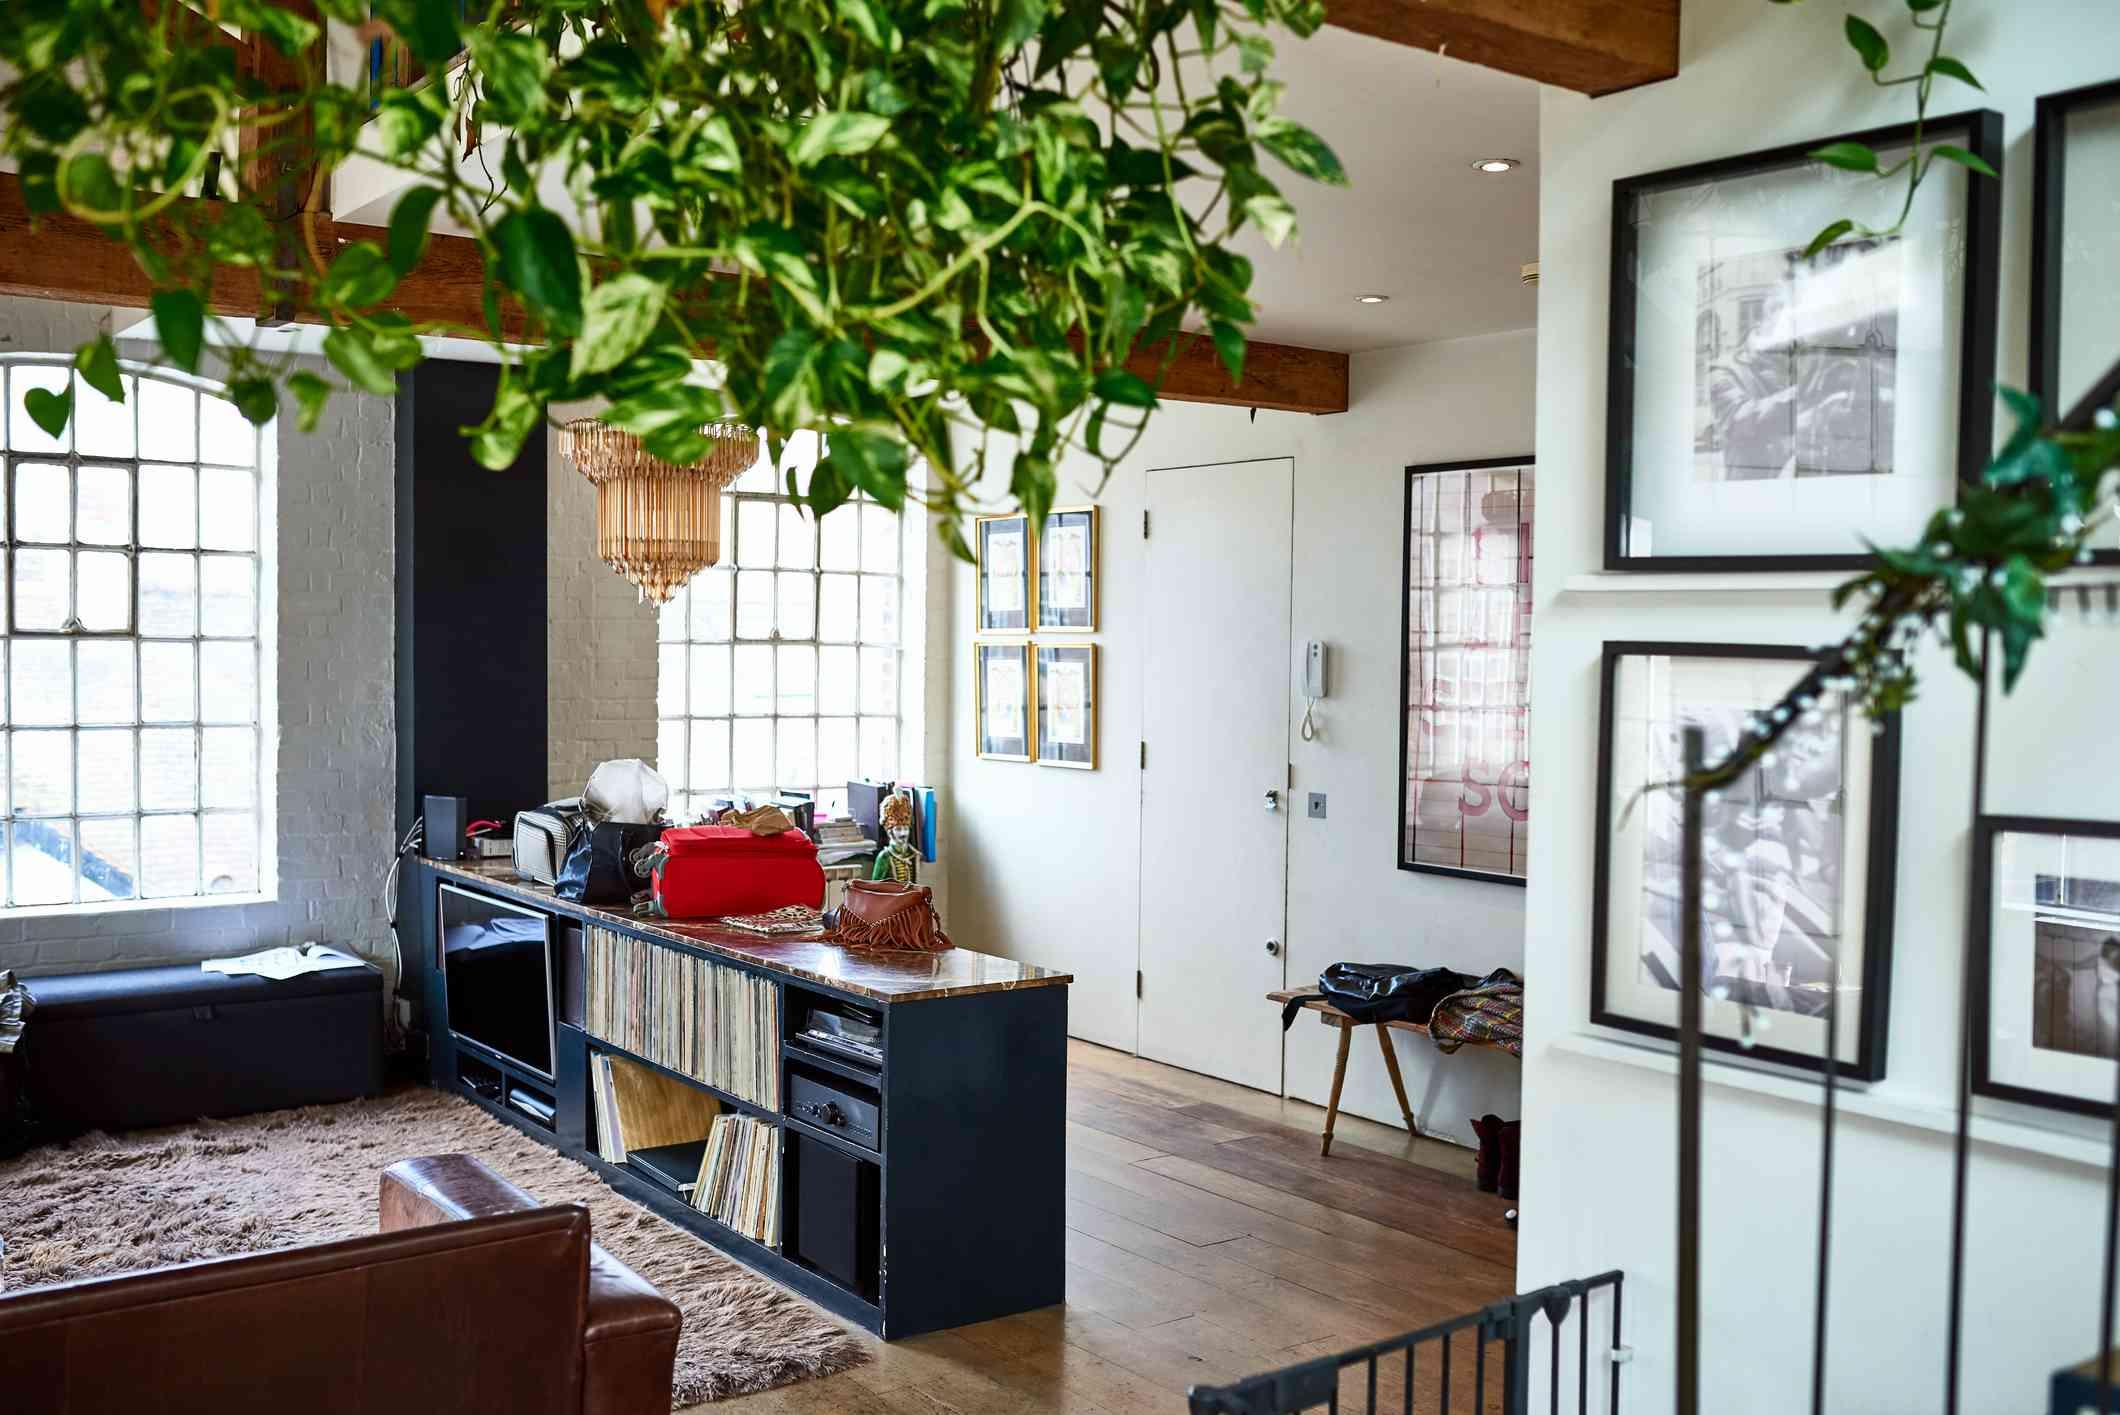 Bohemian living room interior, record collection, apartment, interior design